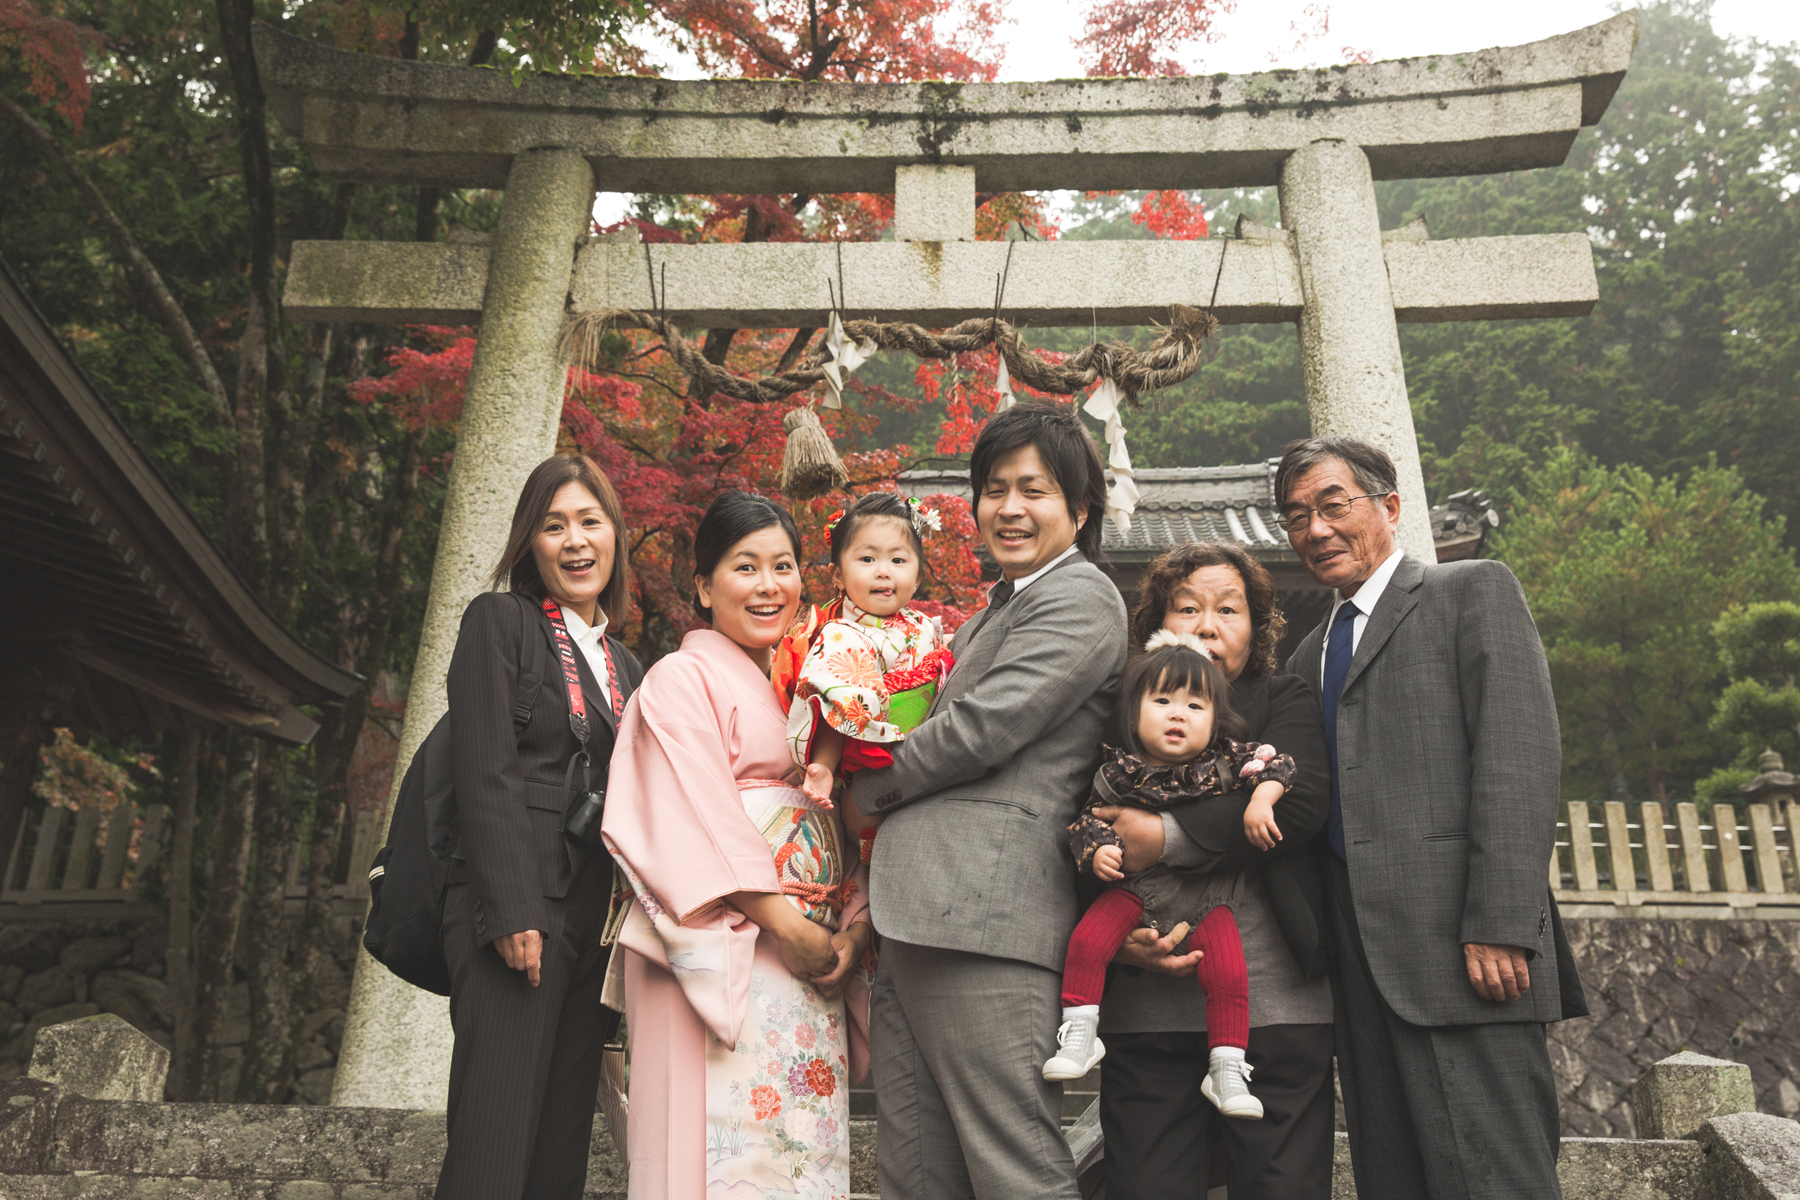 米原市の志賀神社で七五三写真撮影